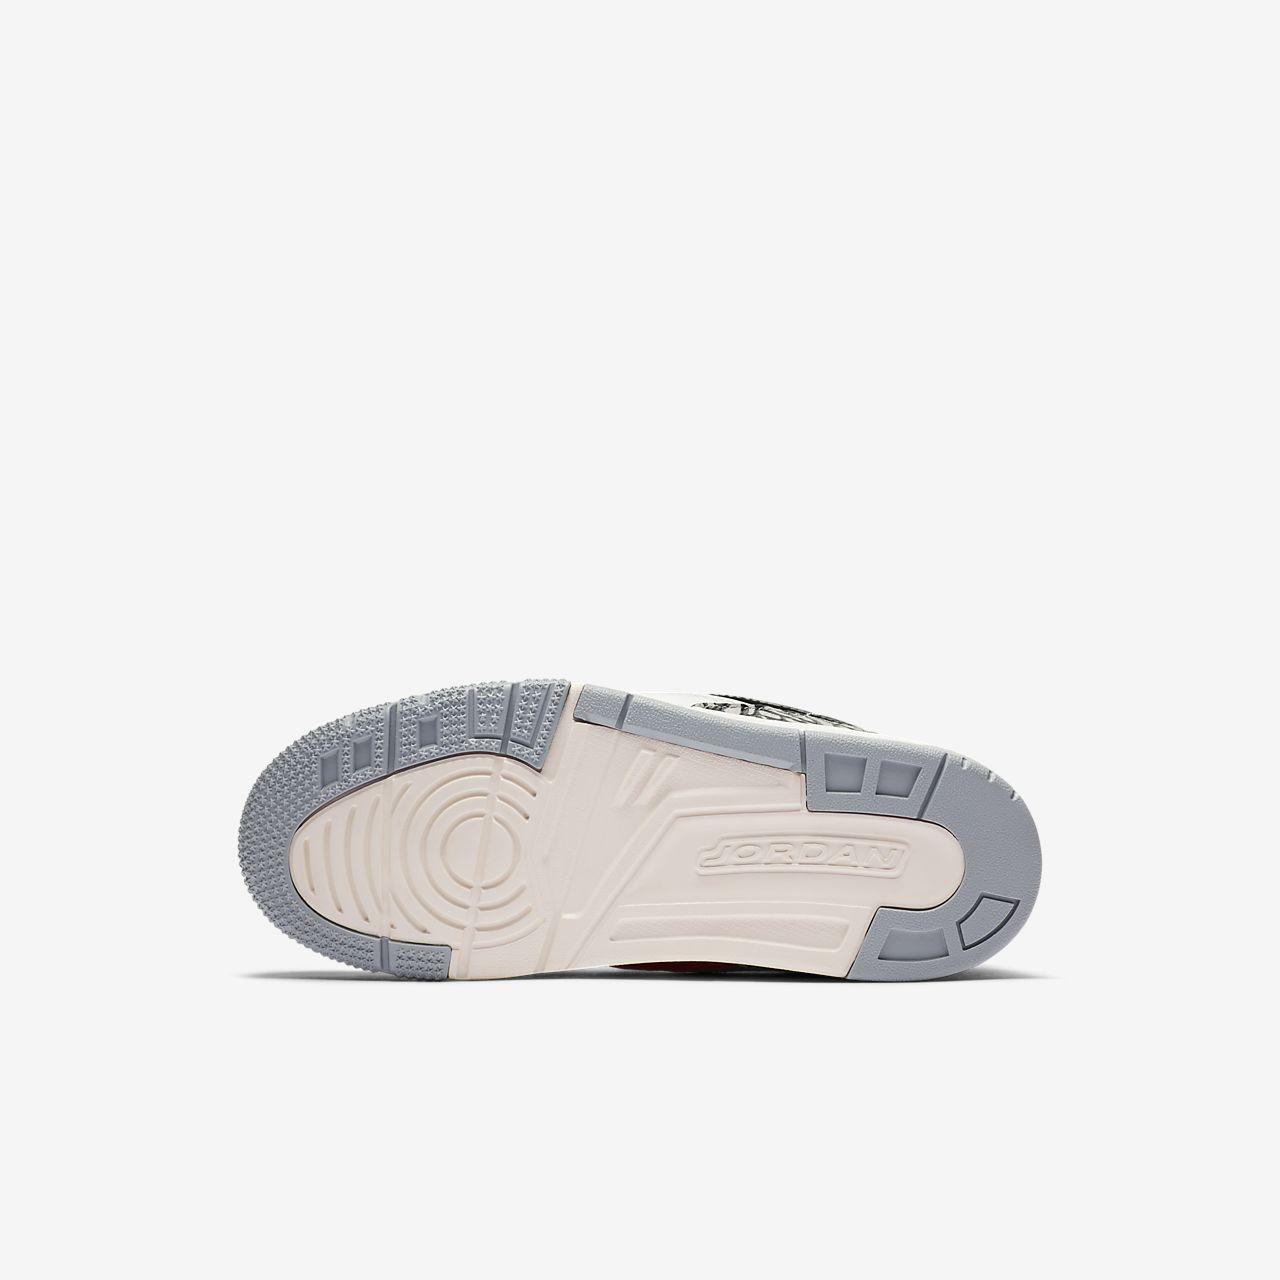 Air Jordan Legacy 312 Low Schuh für jüngere Kinder